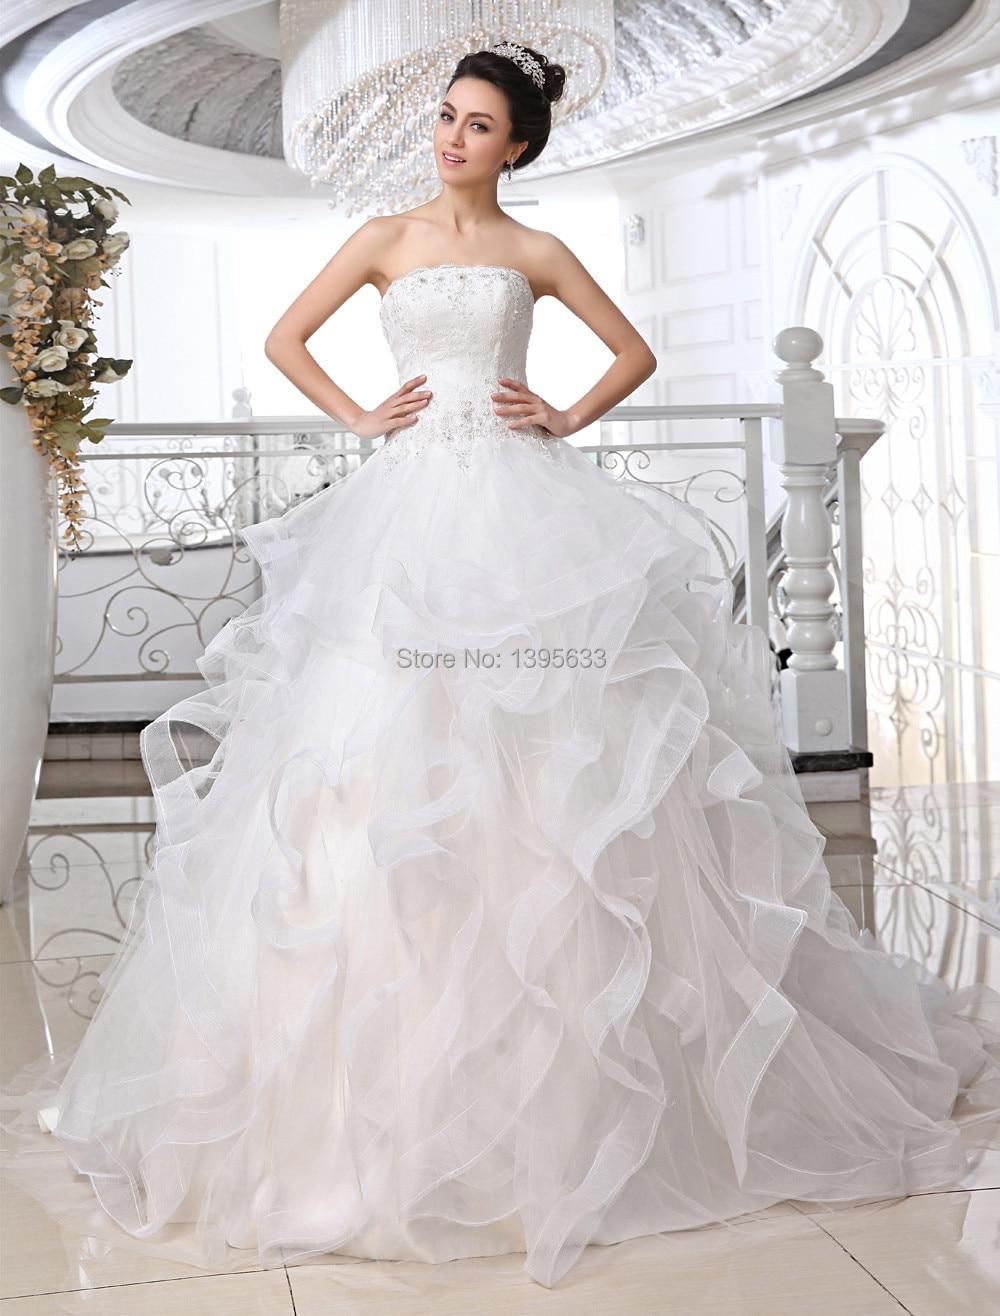 Women Ball Gown Ruffled Full Skirt Wedding Dress Lace Appliques In